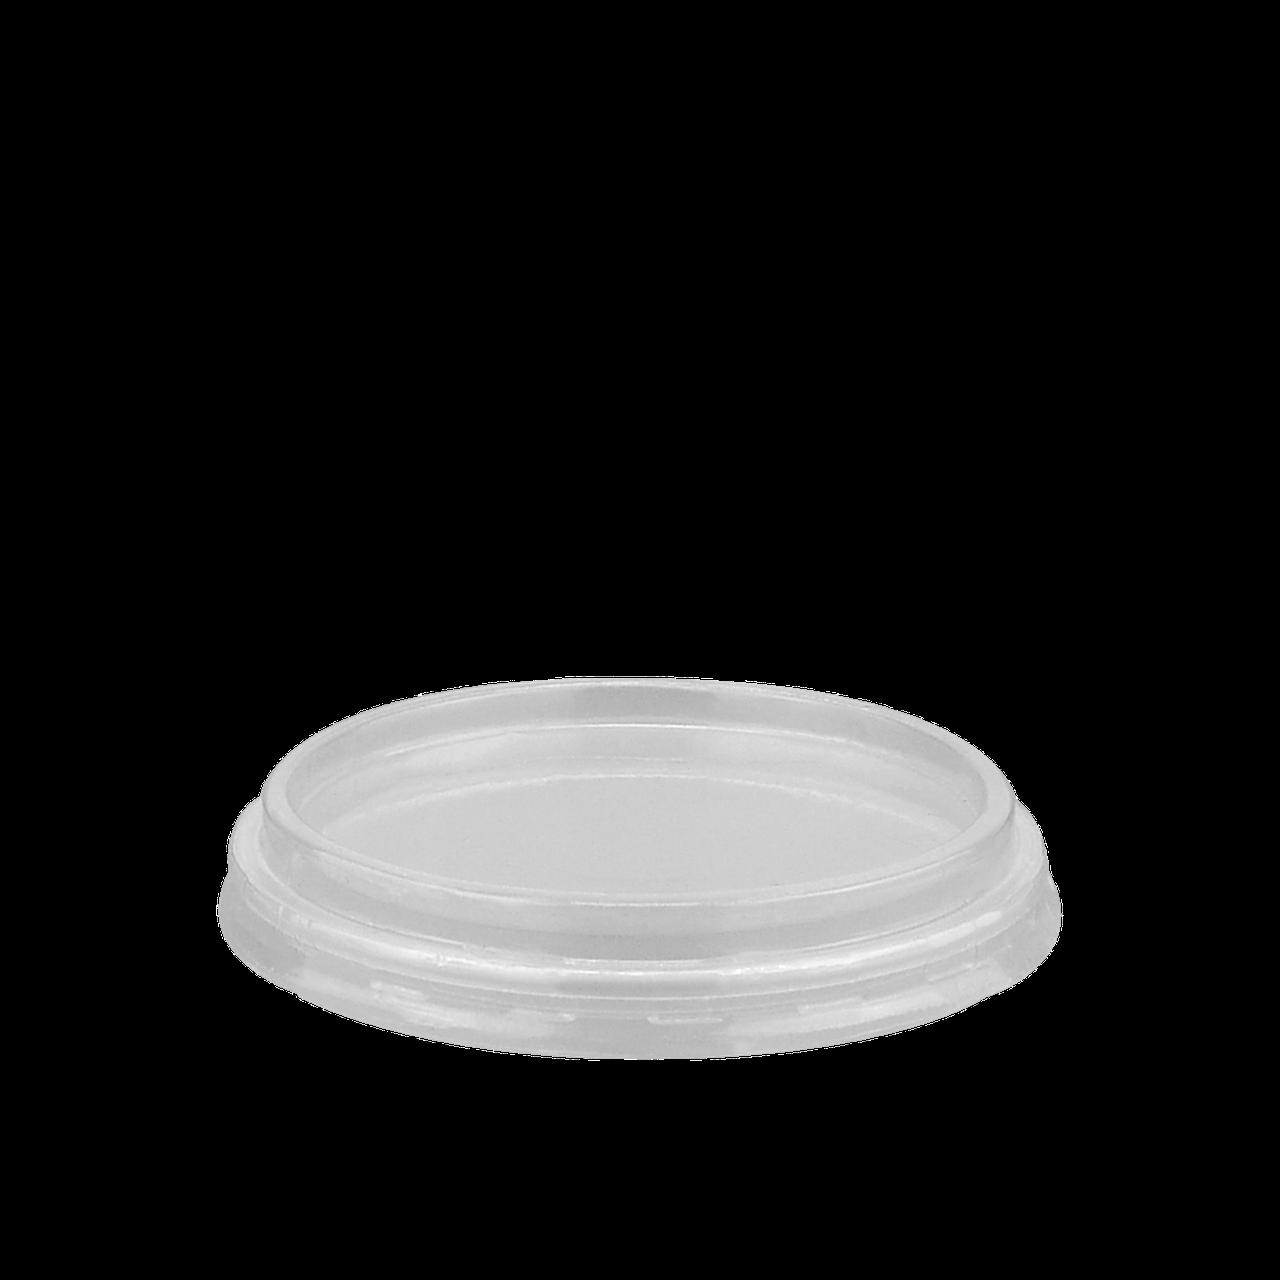 Крышка пластиковая FT68-71 под Соусницу FT154100 100шт